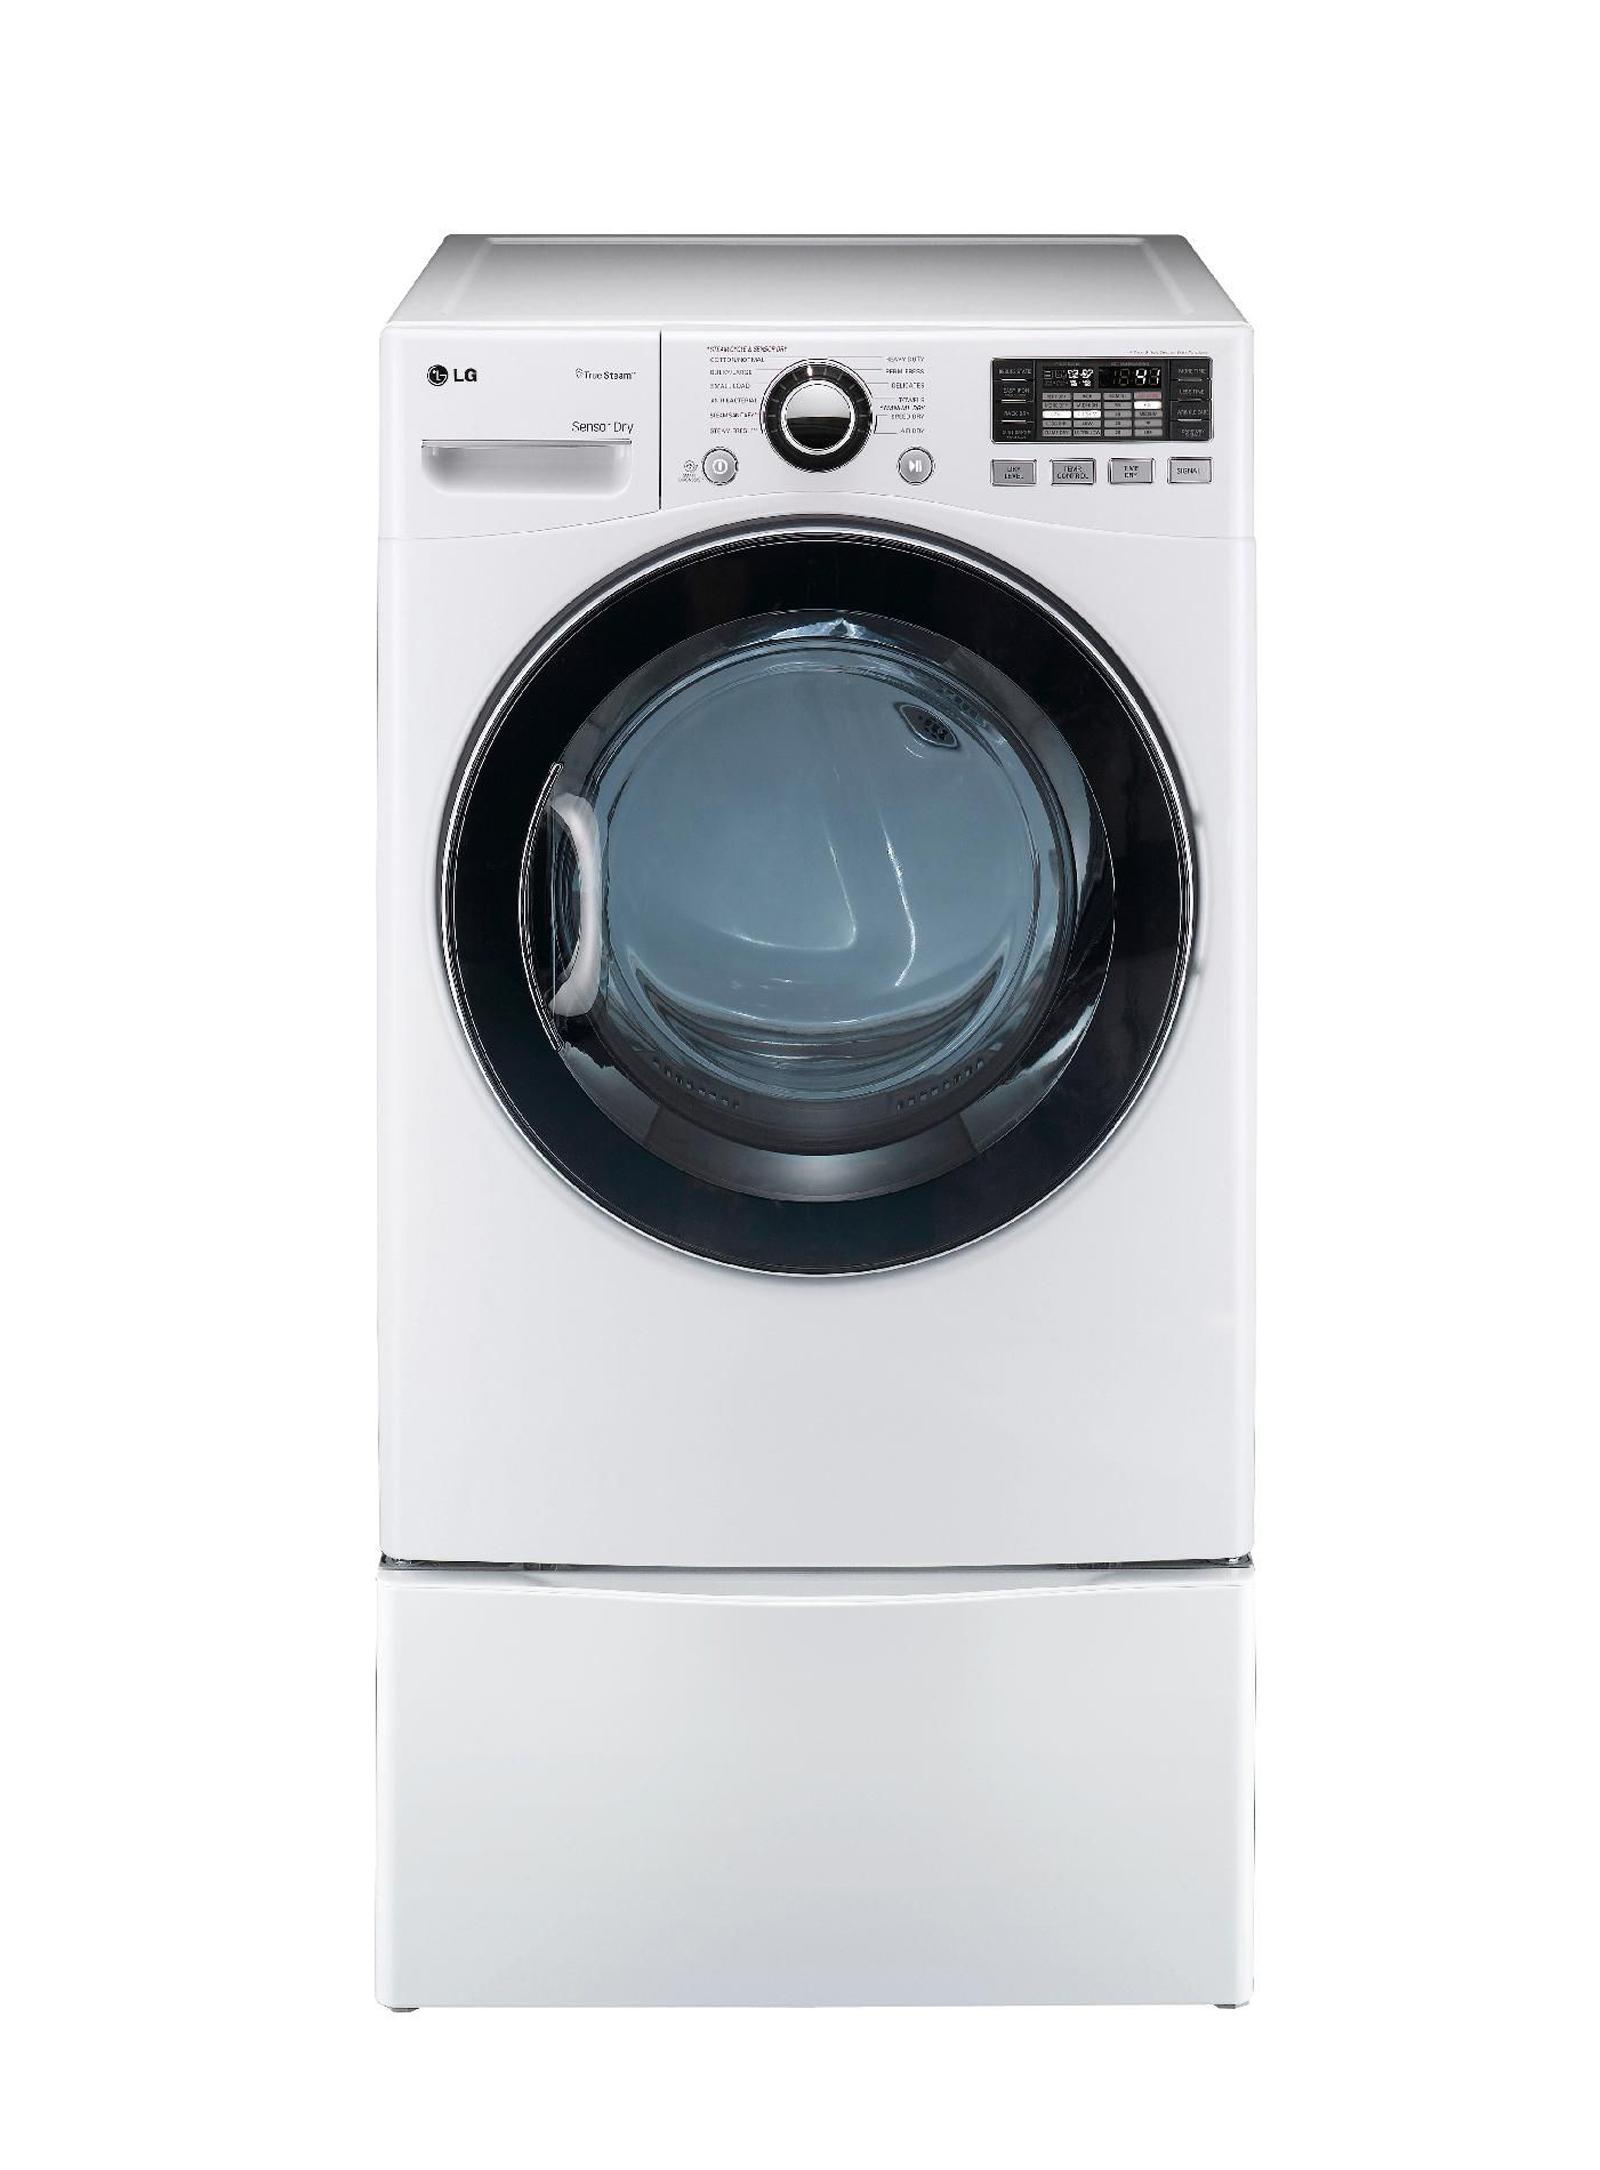 LG 7.3 cu. ft. Steam  Gas Dryer w/ Sensor Dry - White